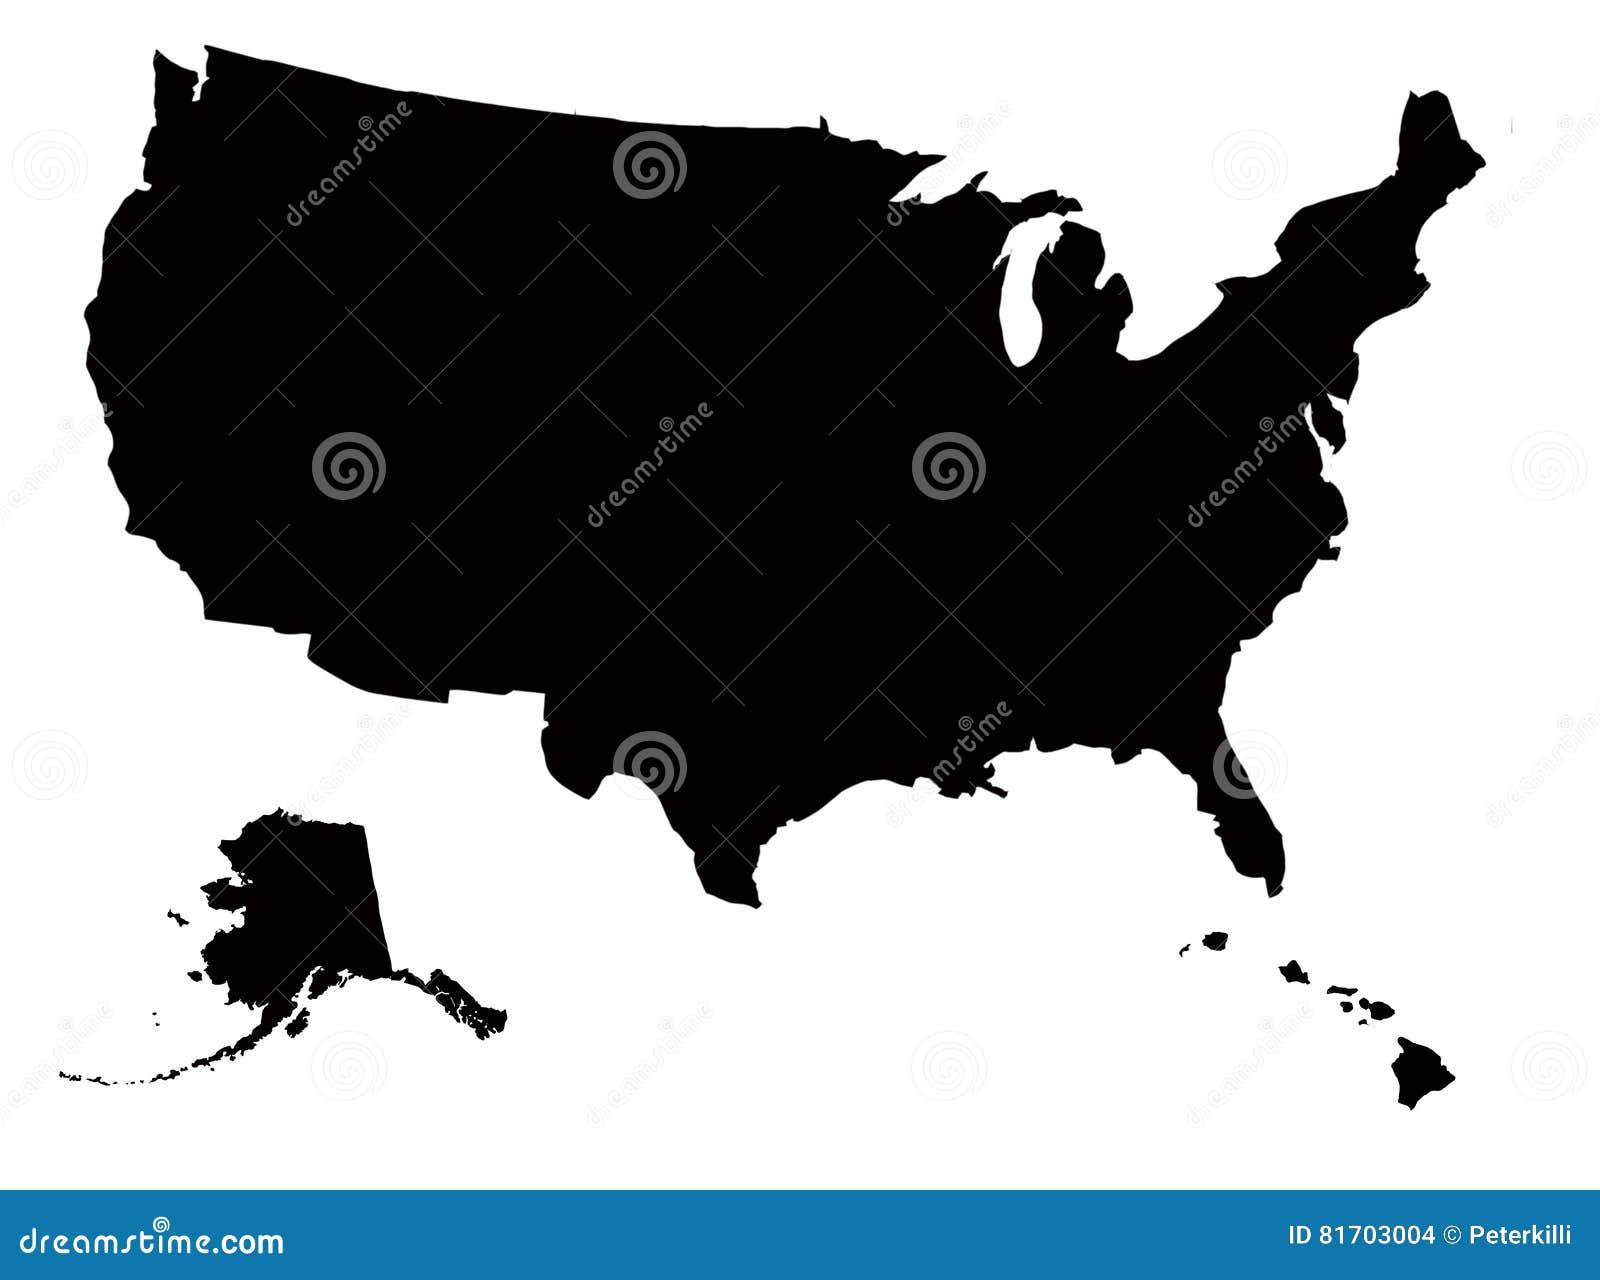 US Map Black In White Background Stock Illustration - Illustration ...